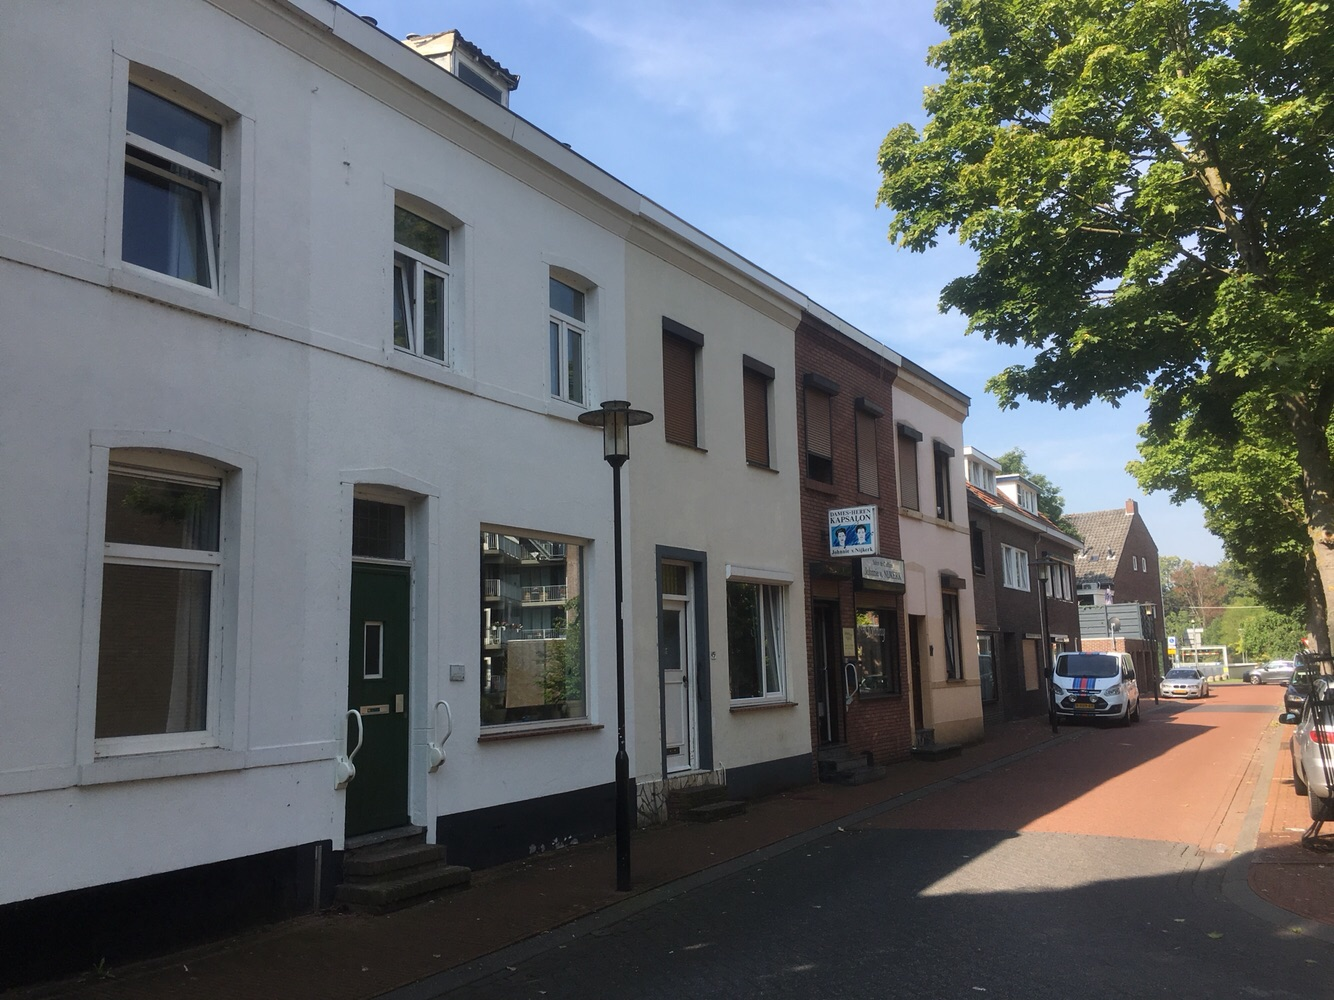 Oude Broeksittarderweg